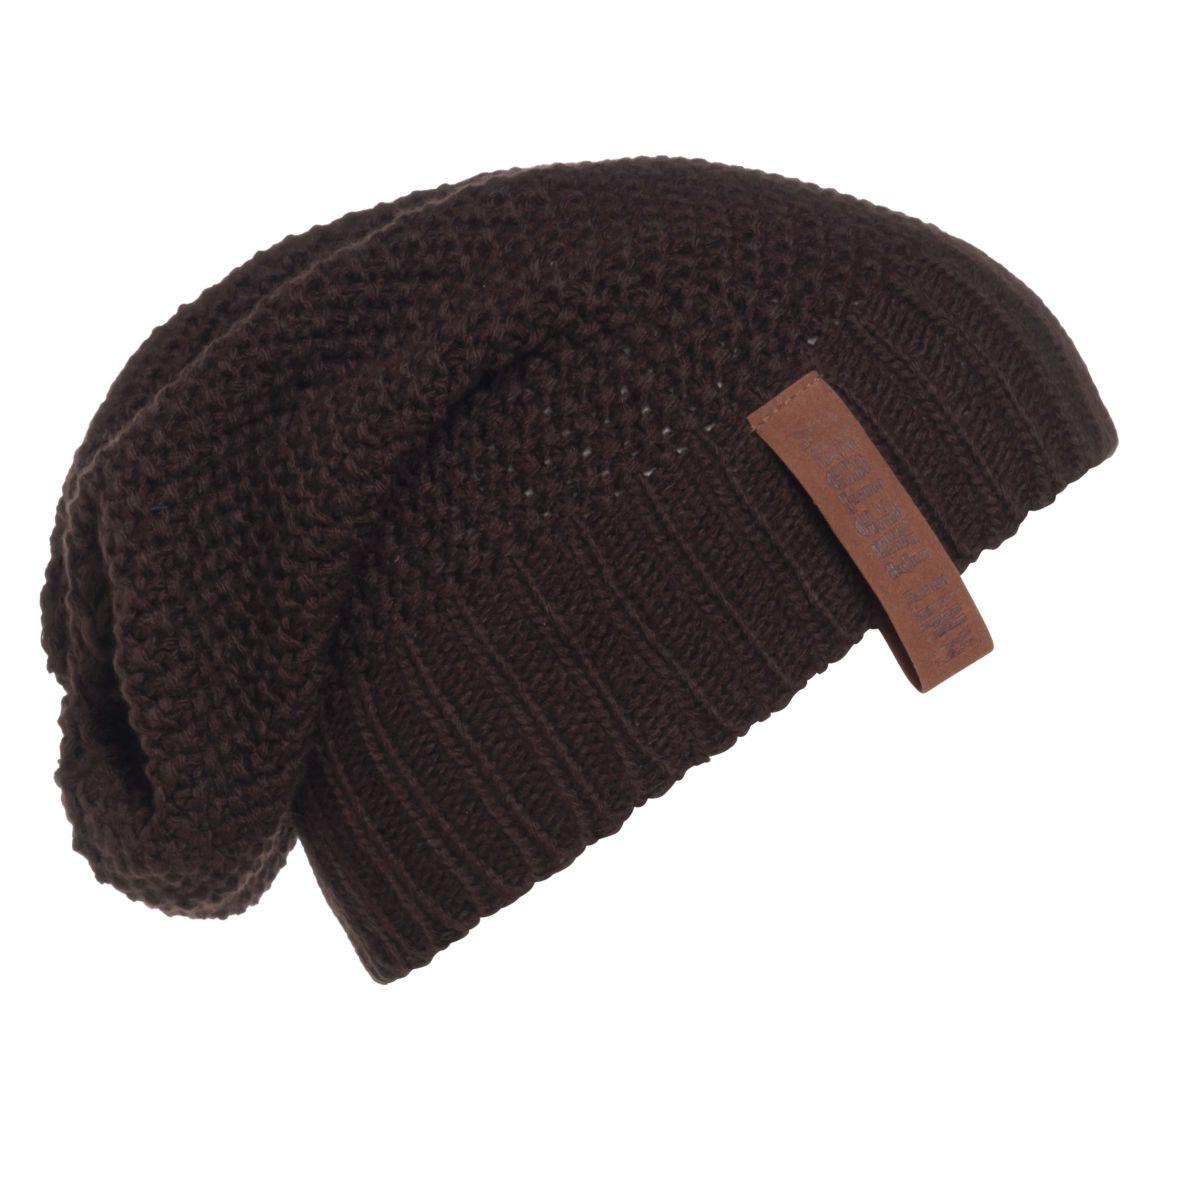 coco beanie dark brown